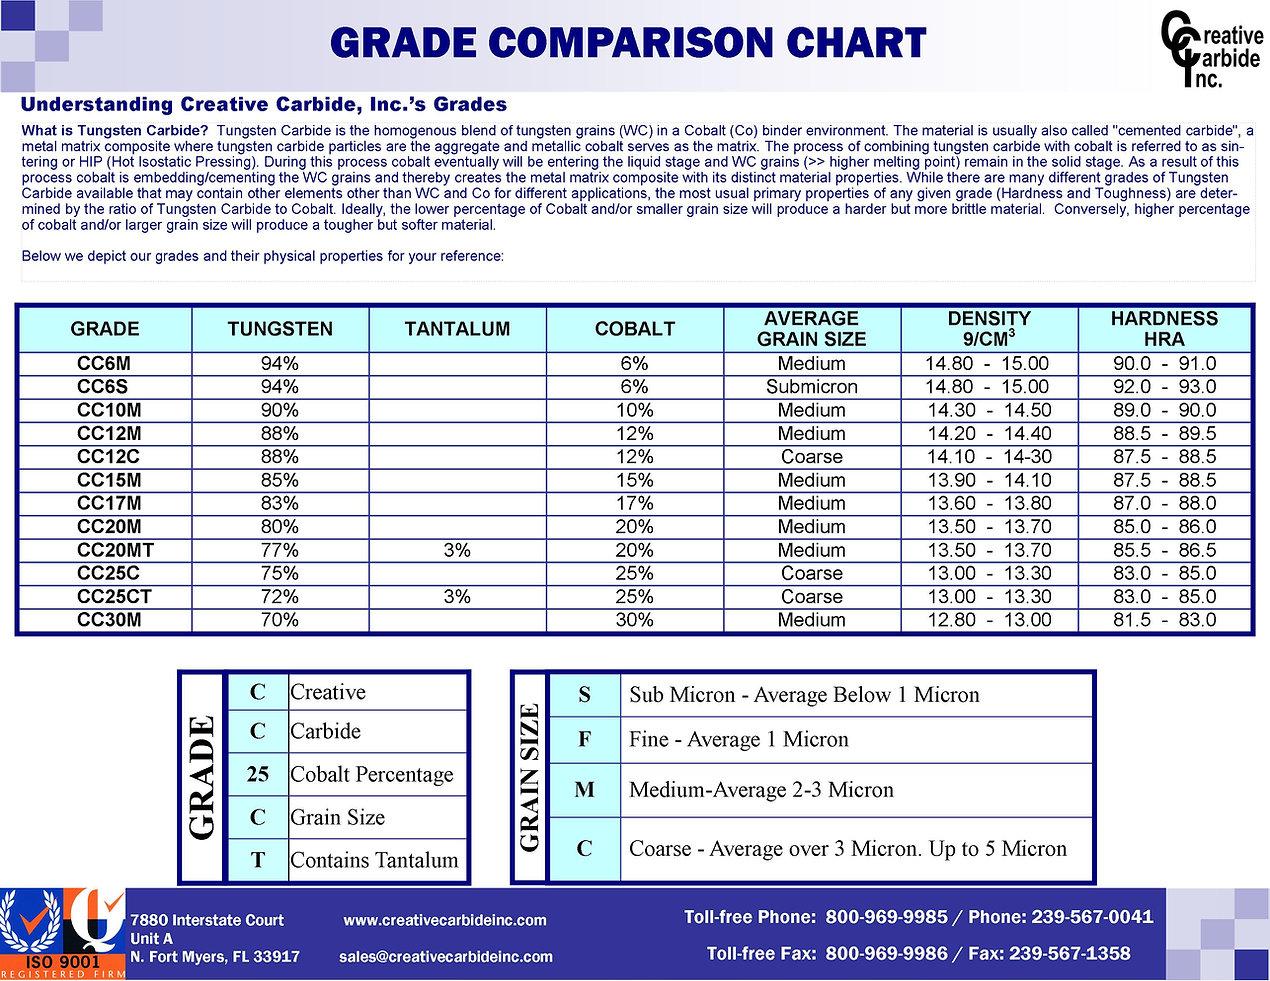 Understanding Our Grades P1.jpg